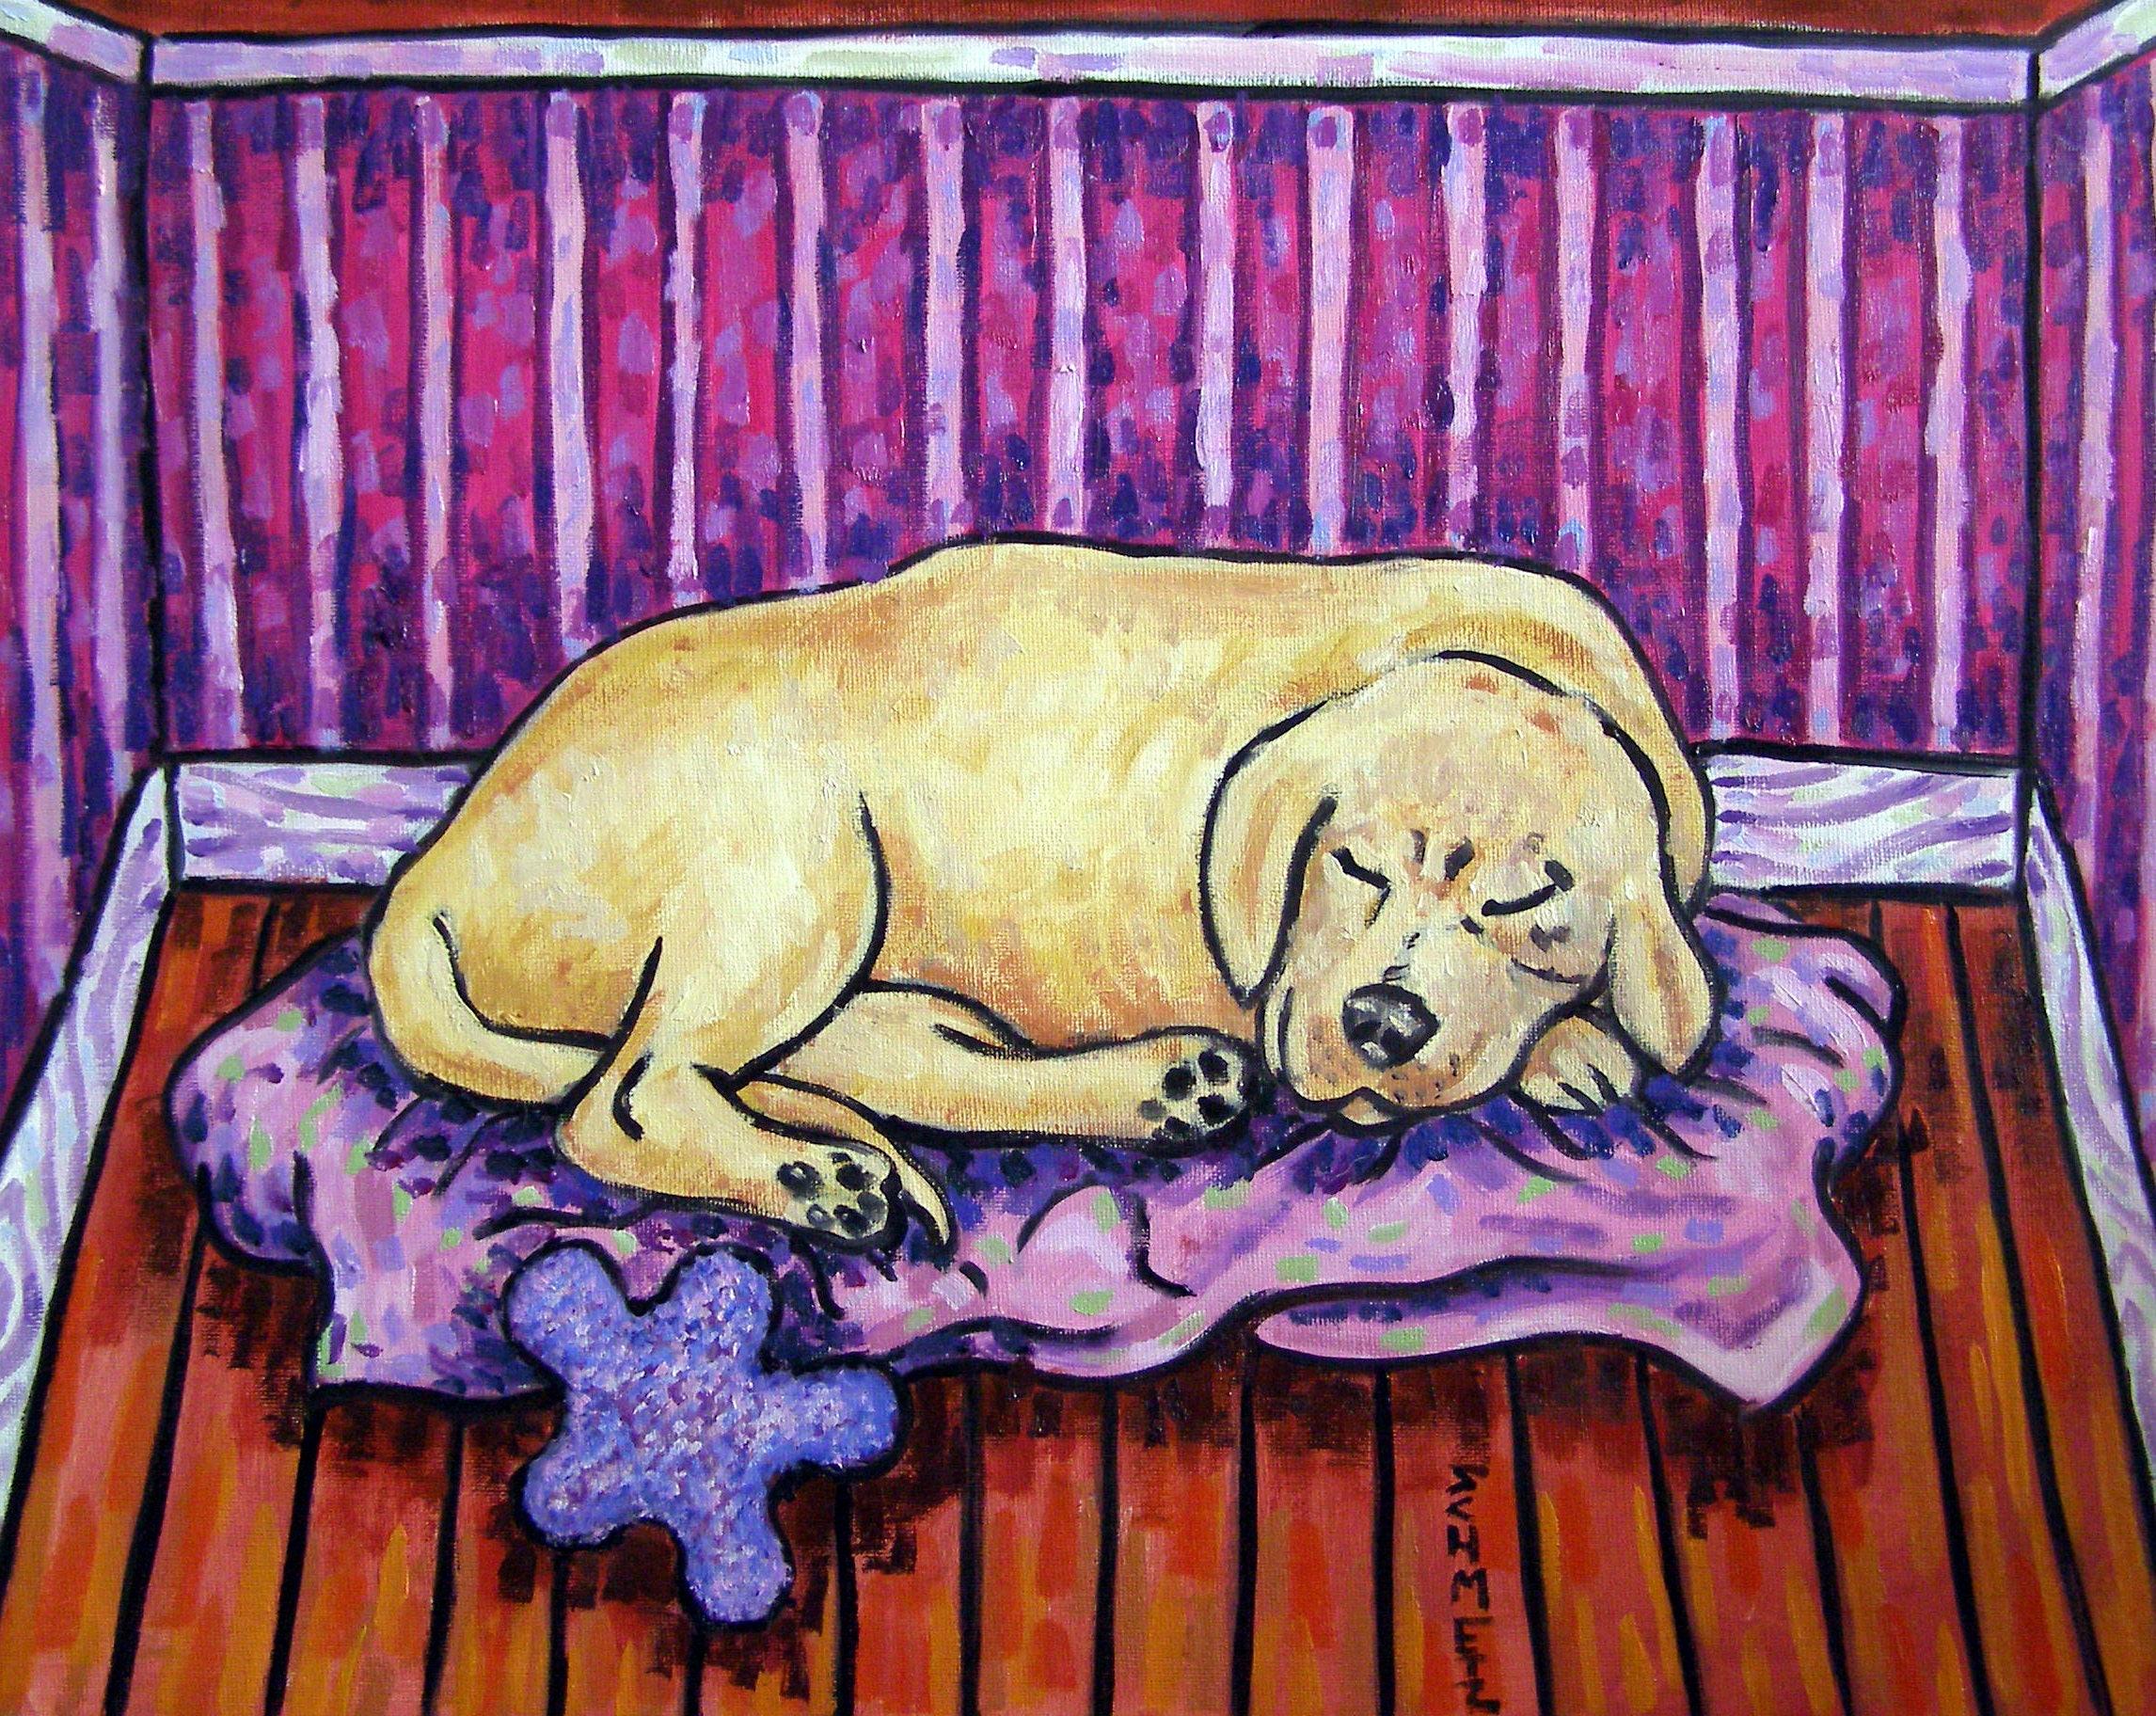 DACHSHUND SLEEPING WITH DOG BOWL SIGNED DOG ART PRINT 13X19 GIFT GIFTS PRINTS